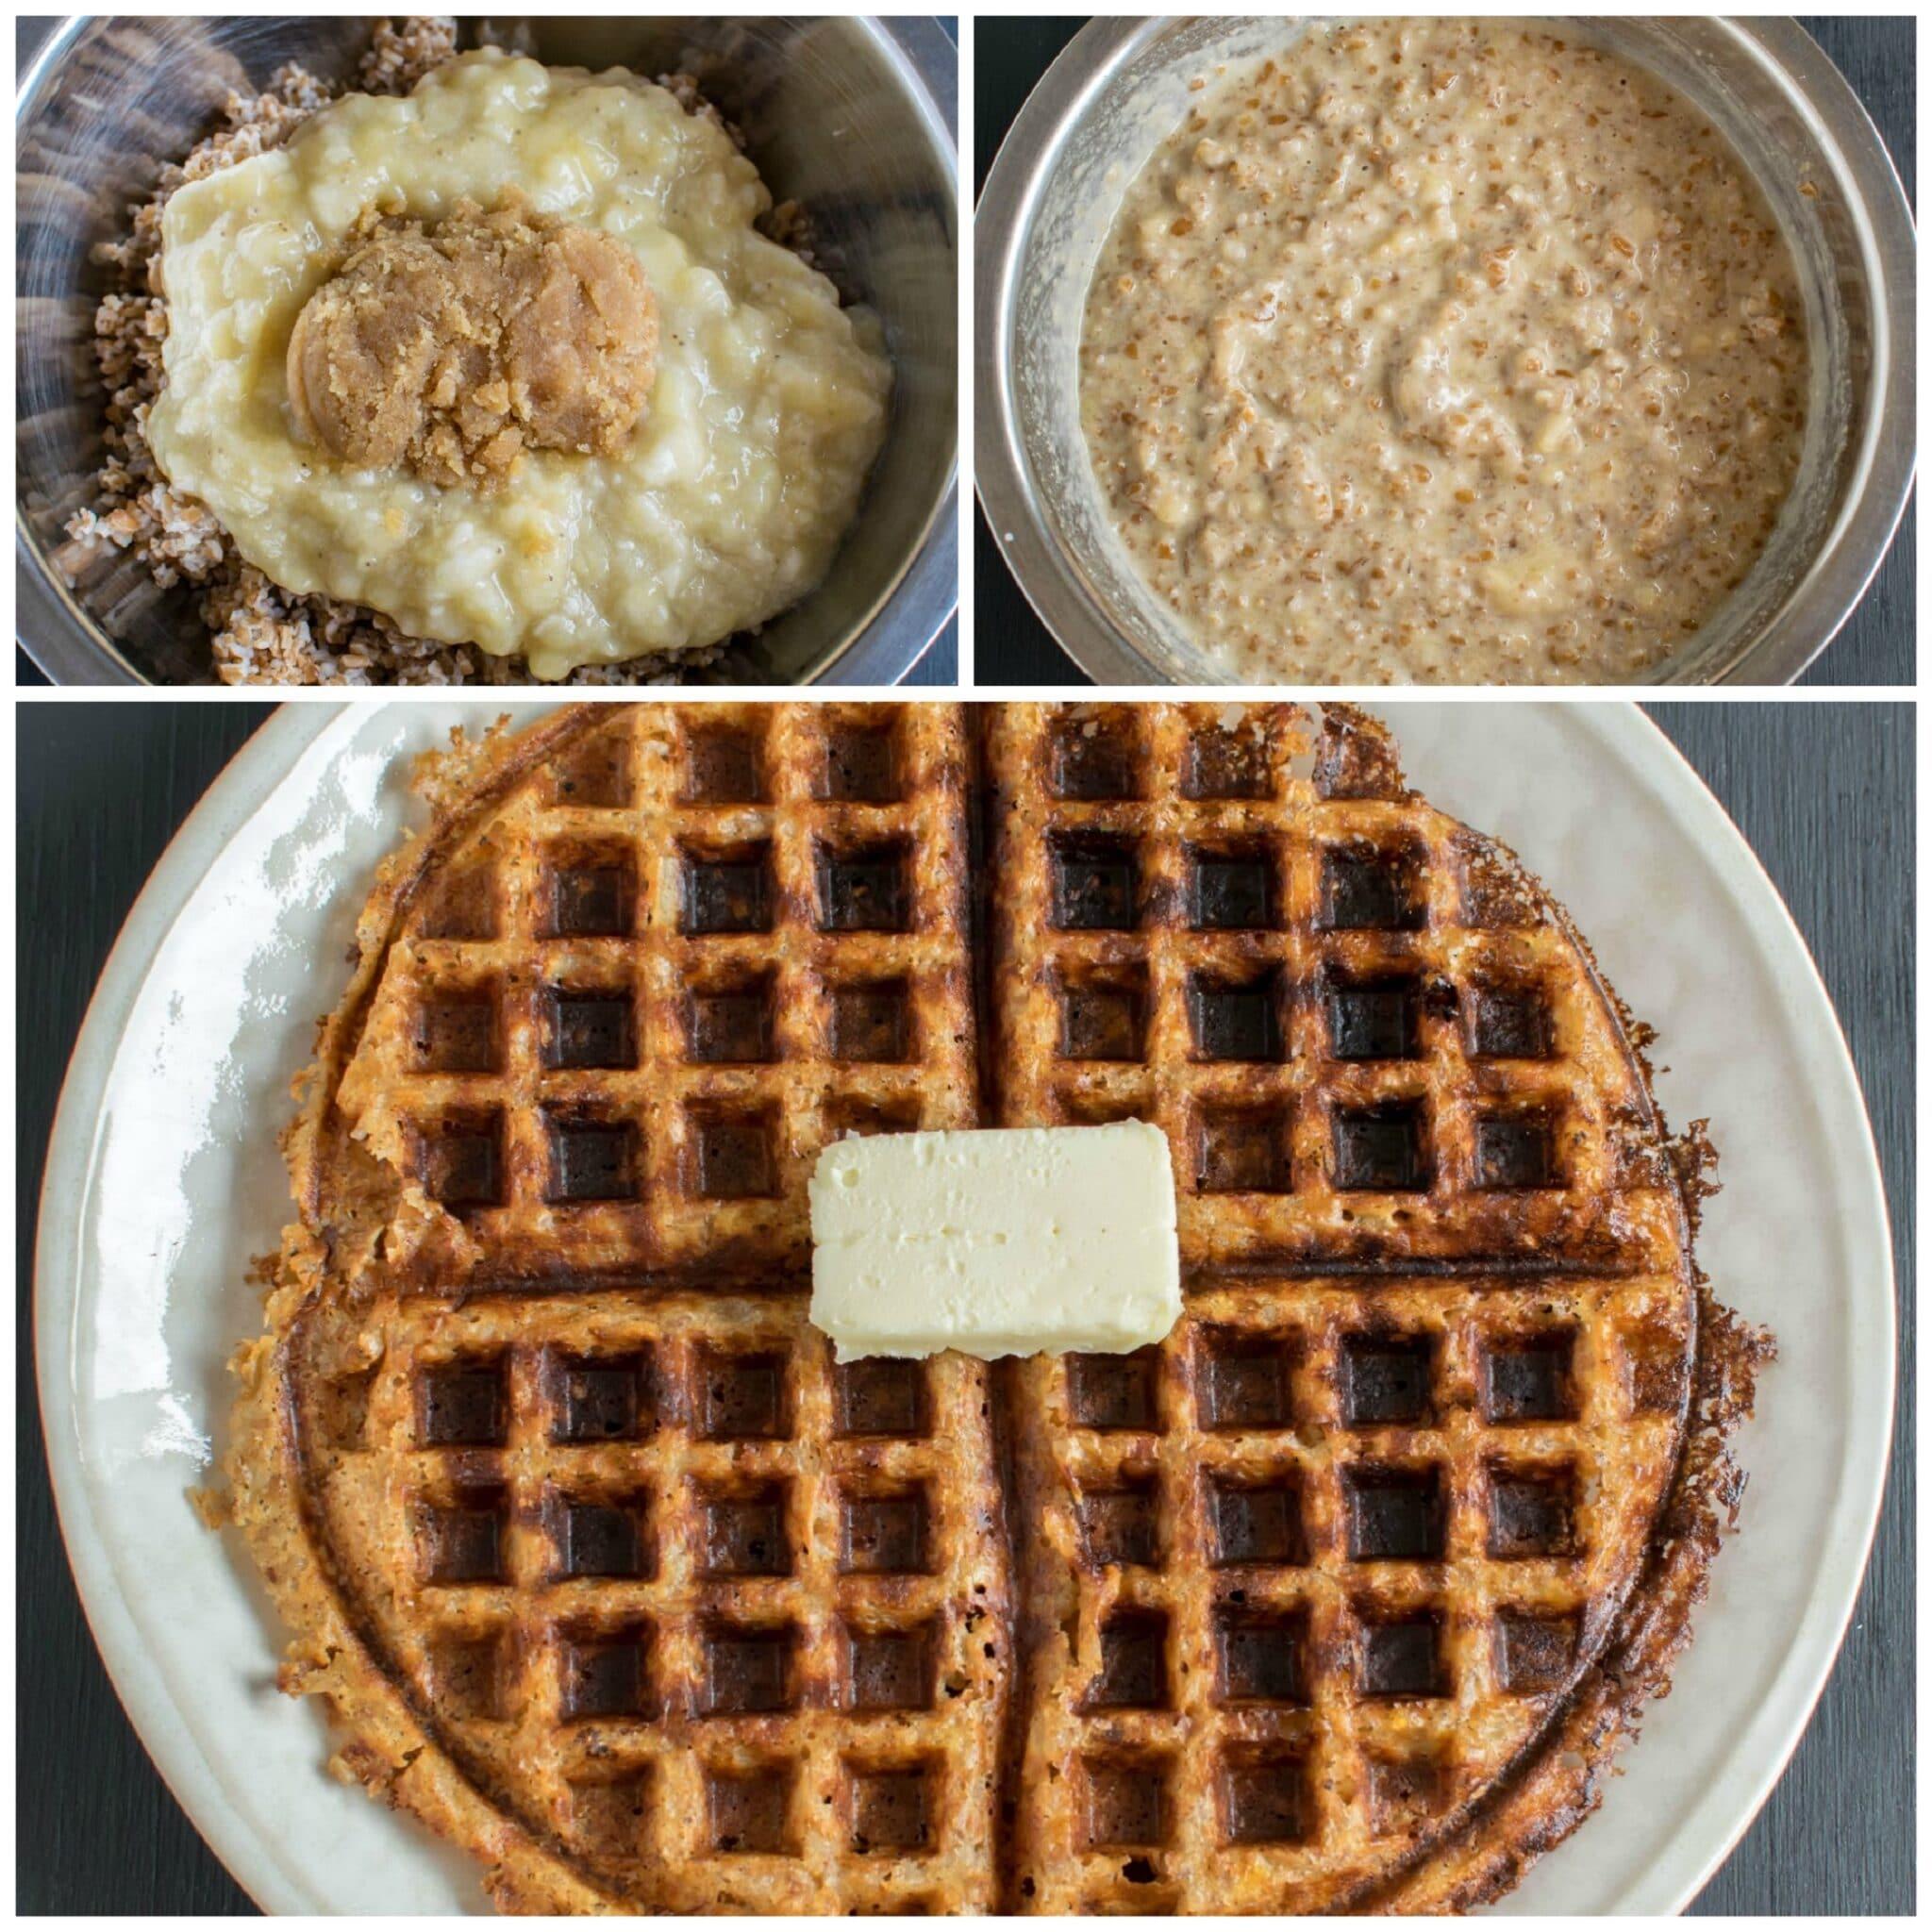 Peanut Butter Bulgur Waffles | homemade peanut butter and whole grain ...